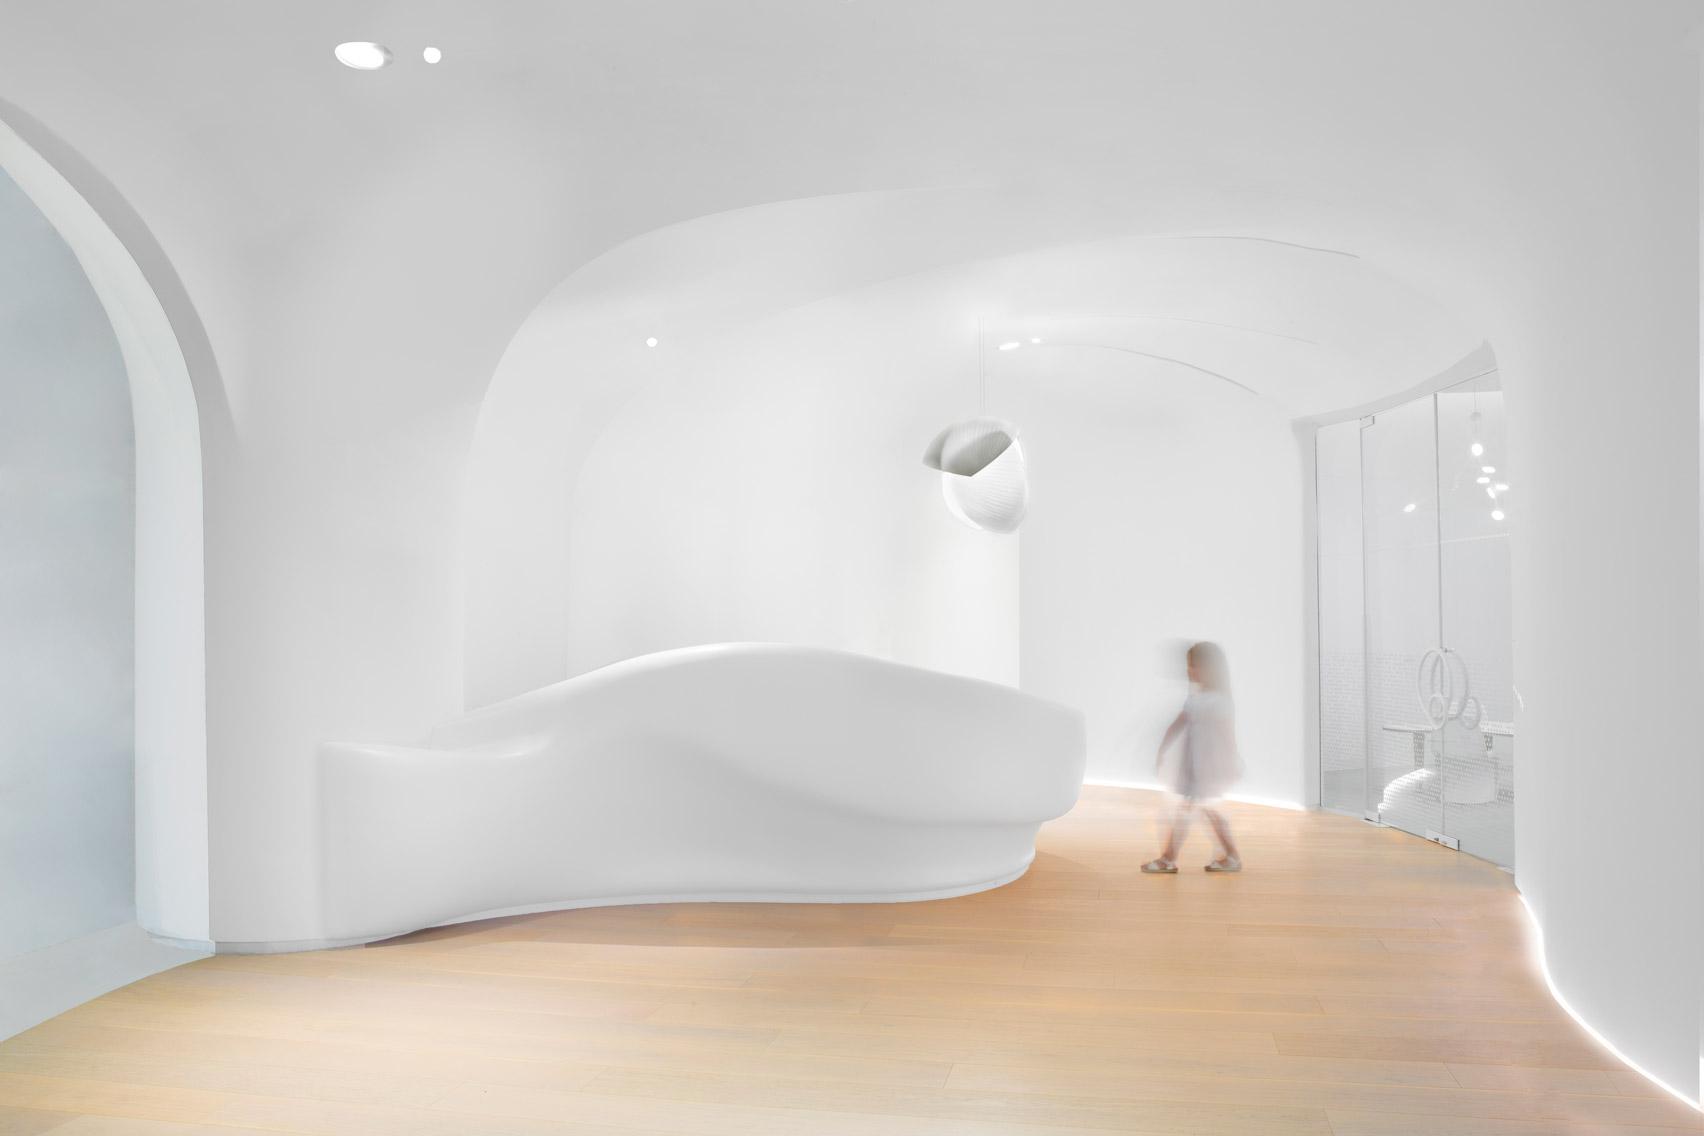 nursery-of-the-future-roar-dubai-دبي تعمل على تطوير حضانة المستقبل